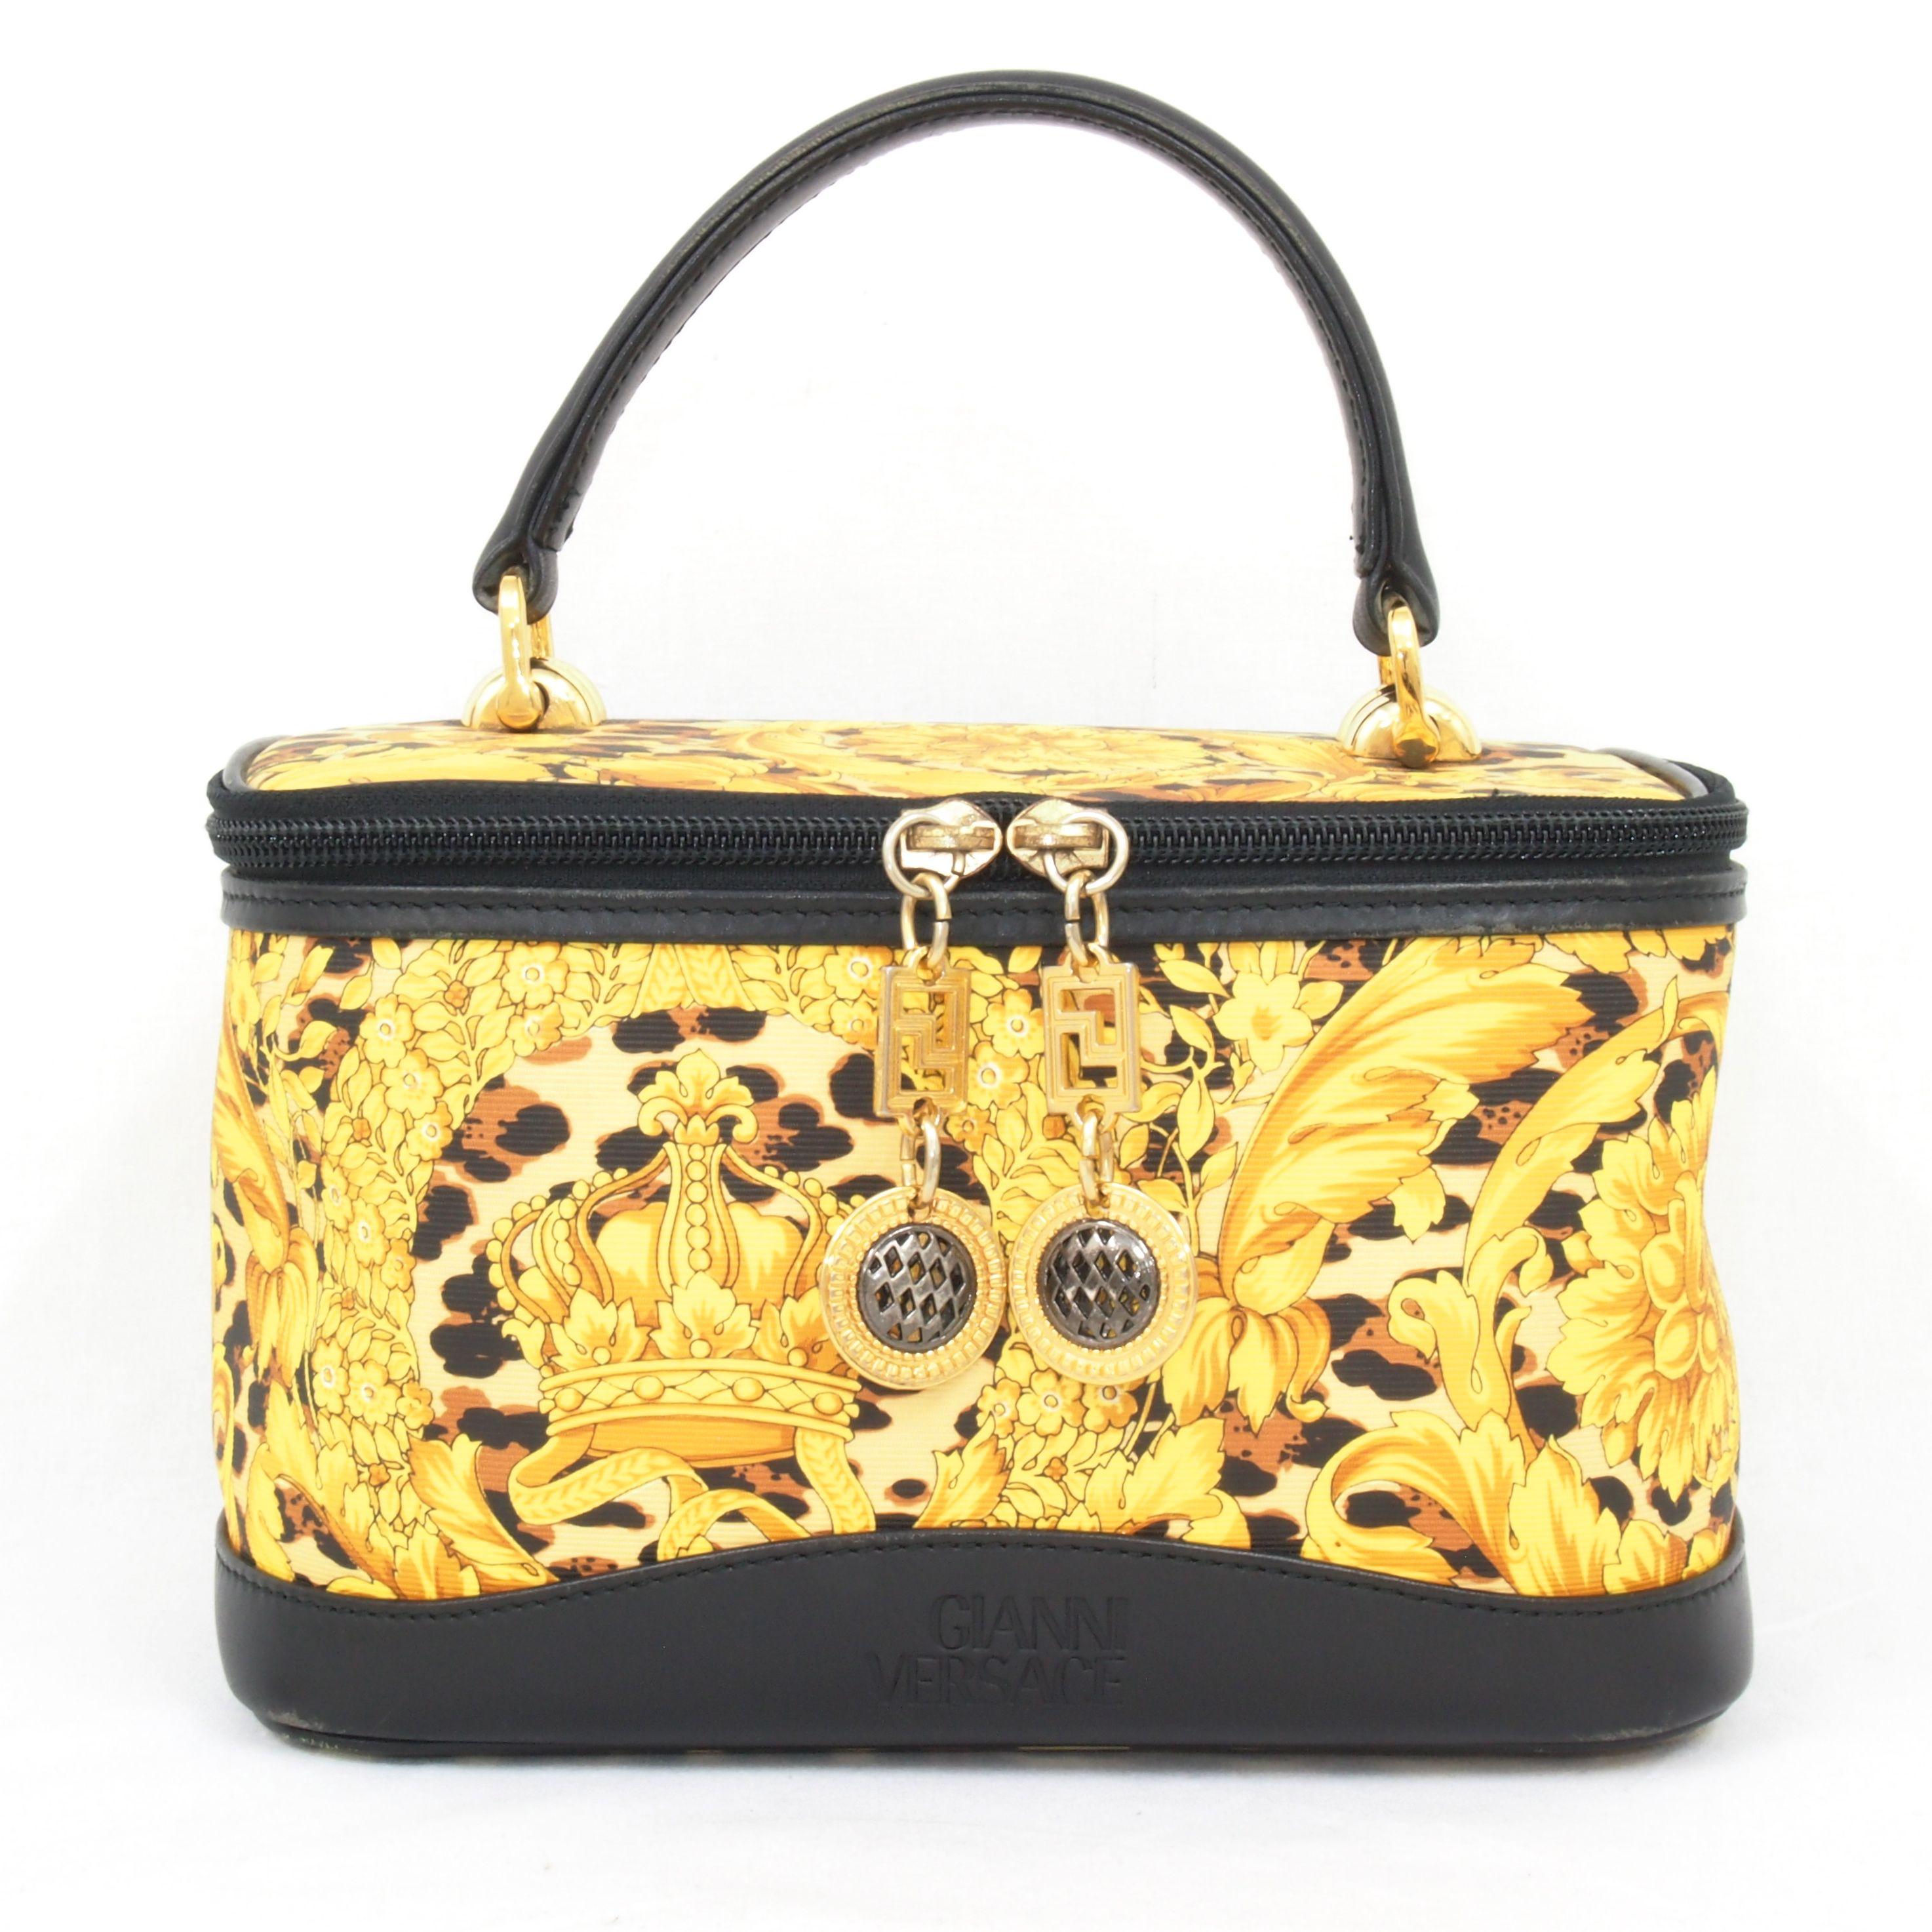 78dd6f40 Vintage Gianni Versace Vanity Bag leopard Medusa Handbag Evening ...